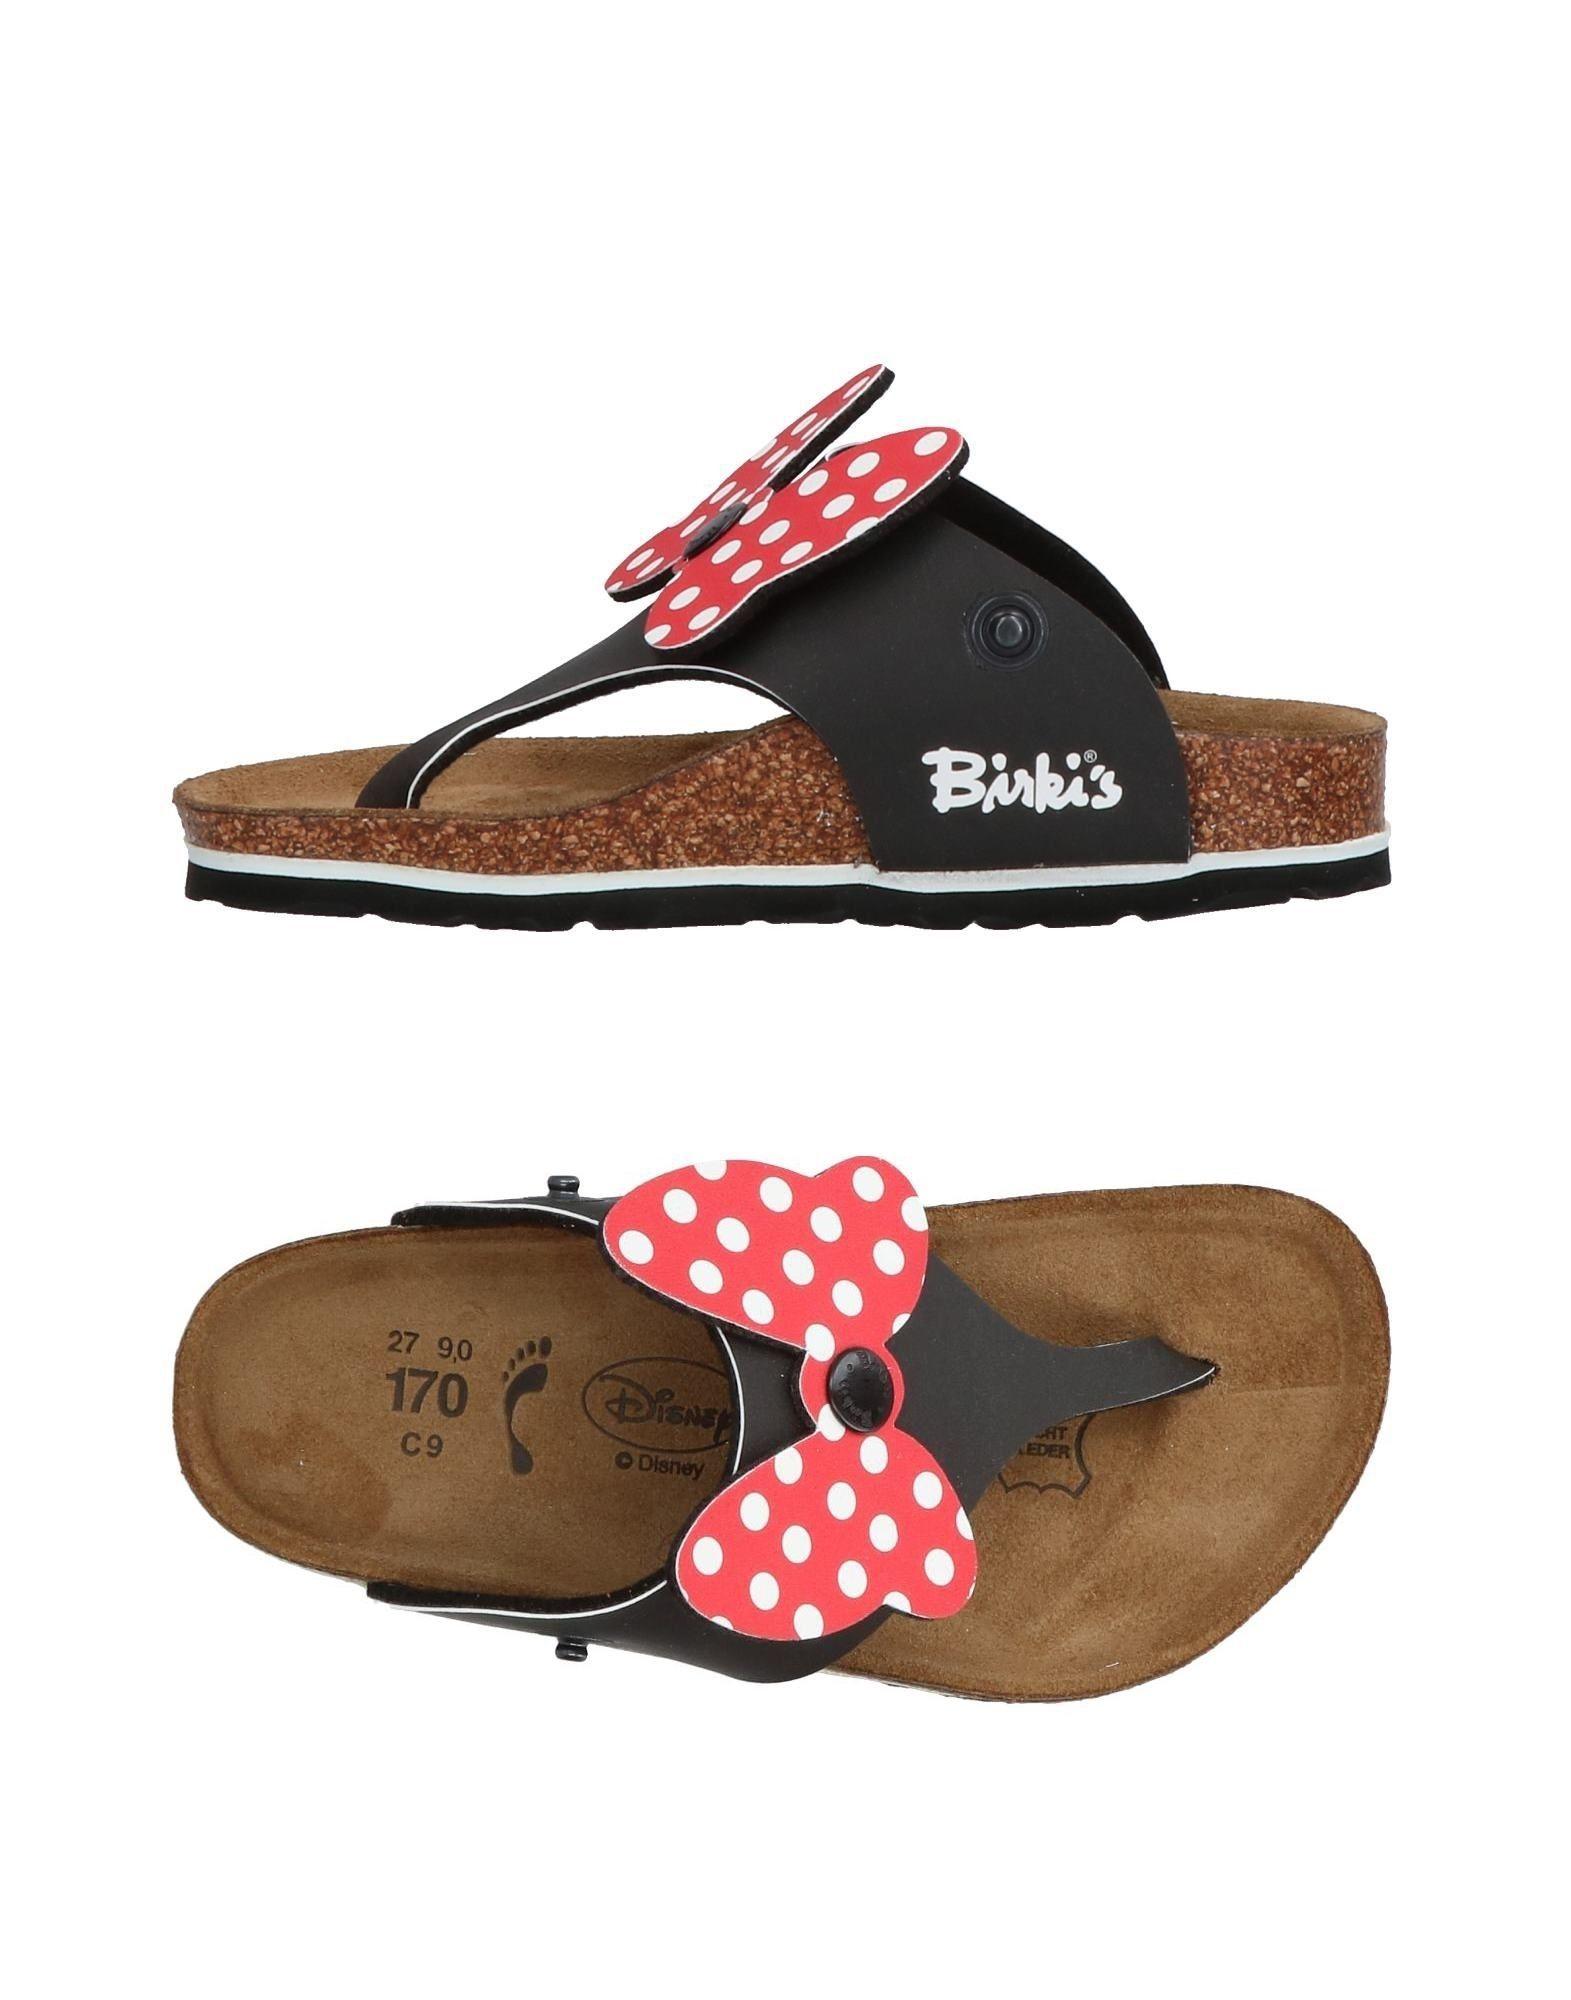 BIRKIS Toe strap sandals